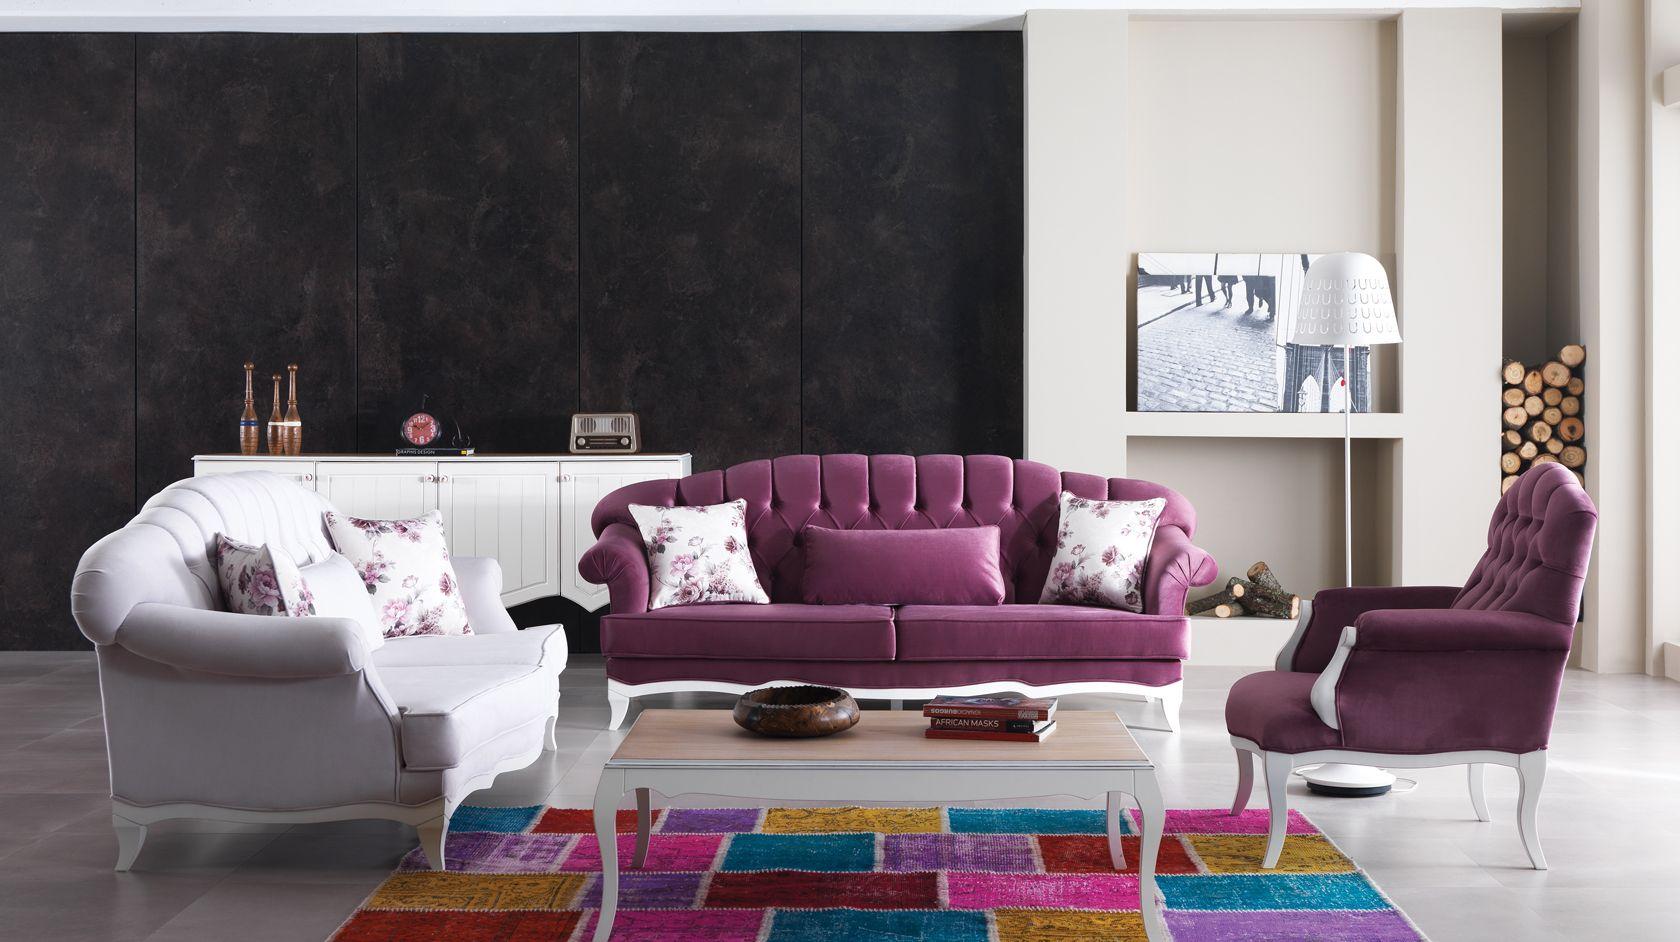 Lucca Koltuk Takimi Decorall Mobilya Silivri Istanbul Mobilya Koltuklar Furniture